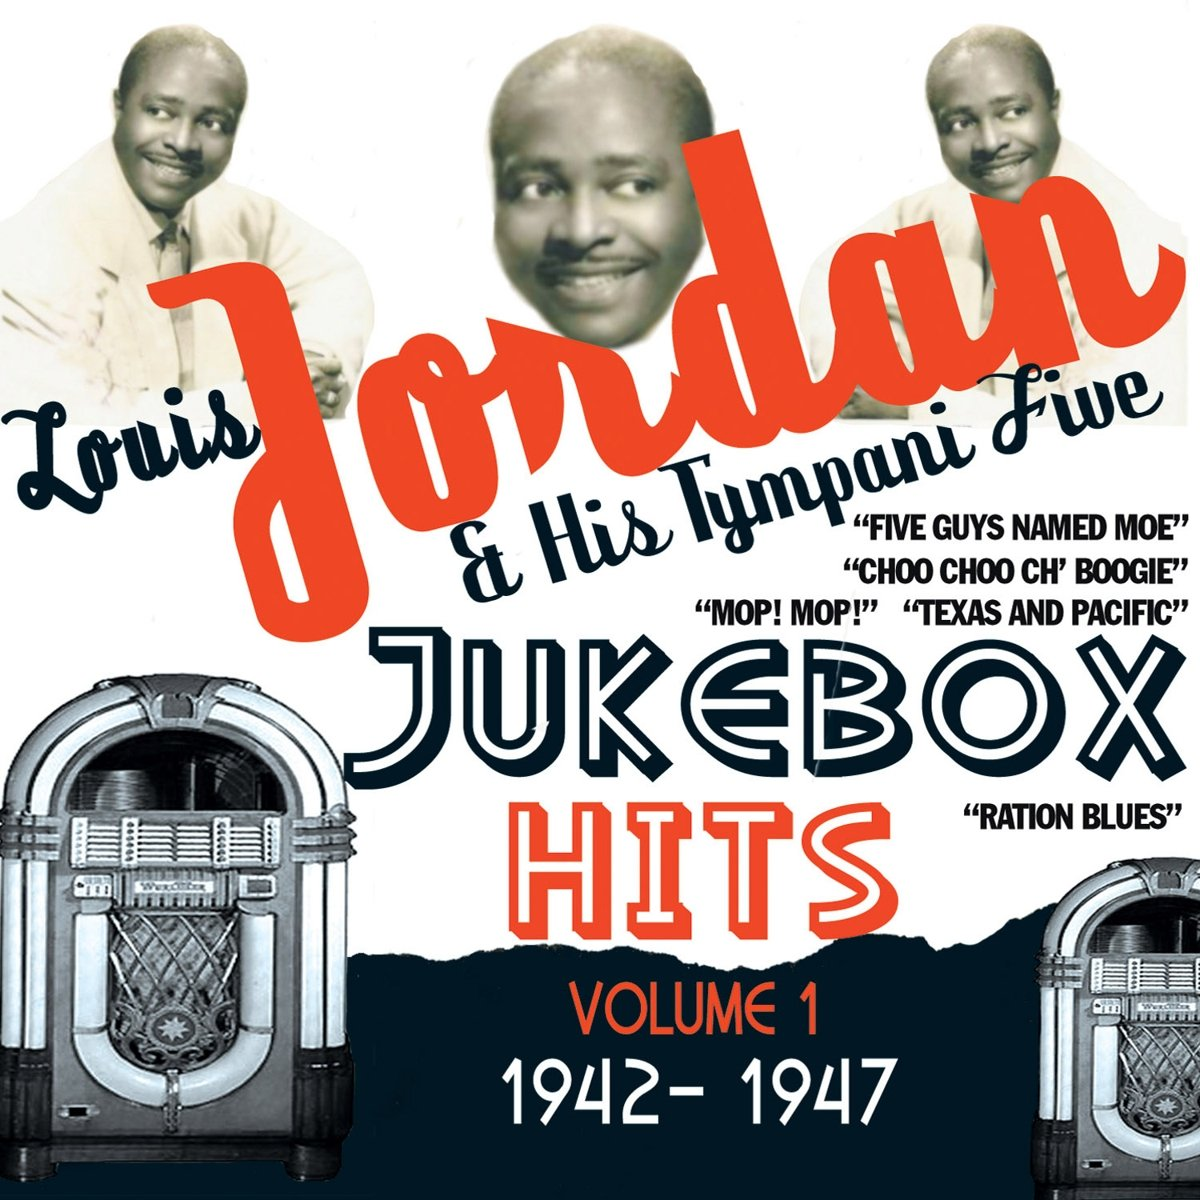 Jukebox Hits Vol 1 1942-1947